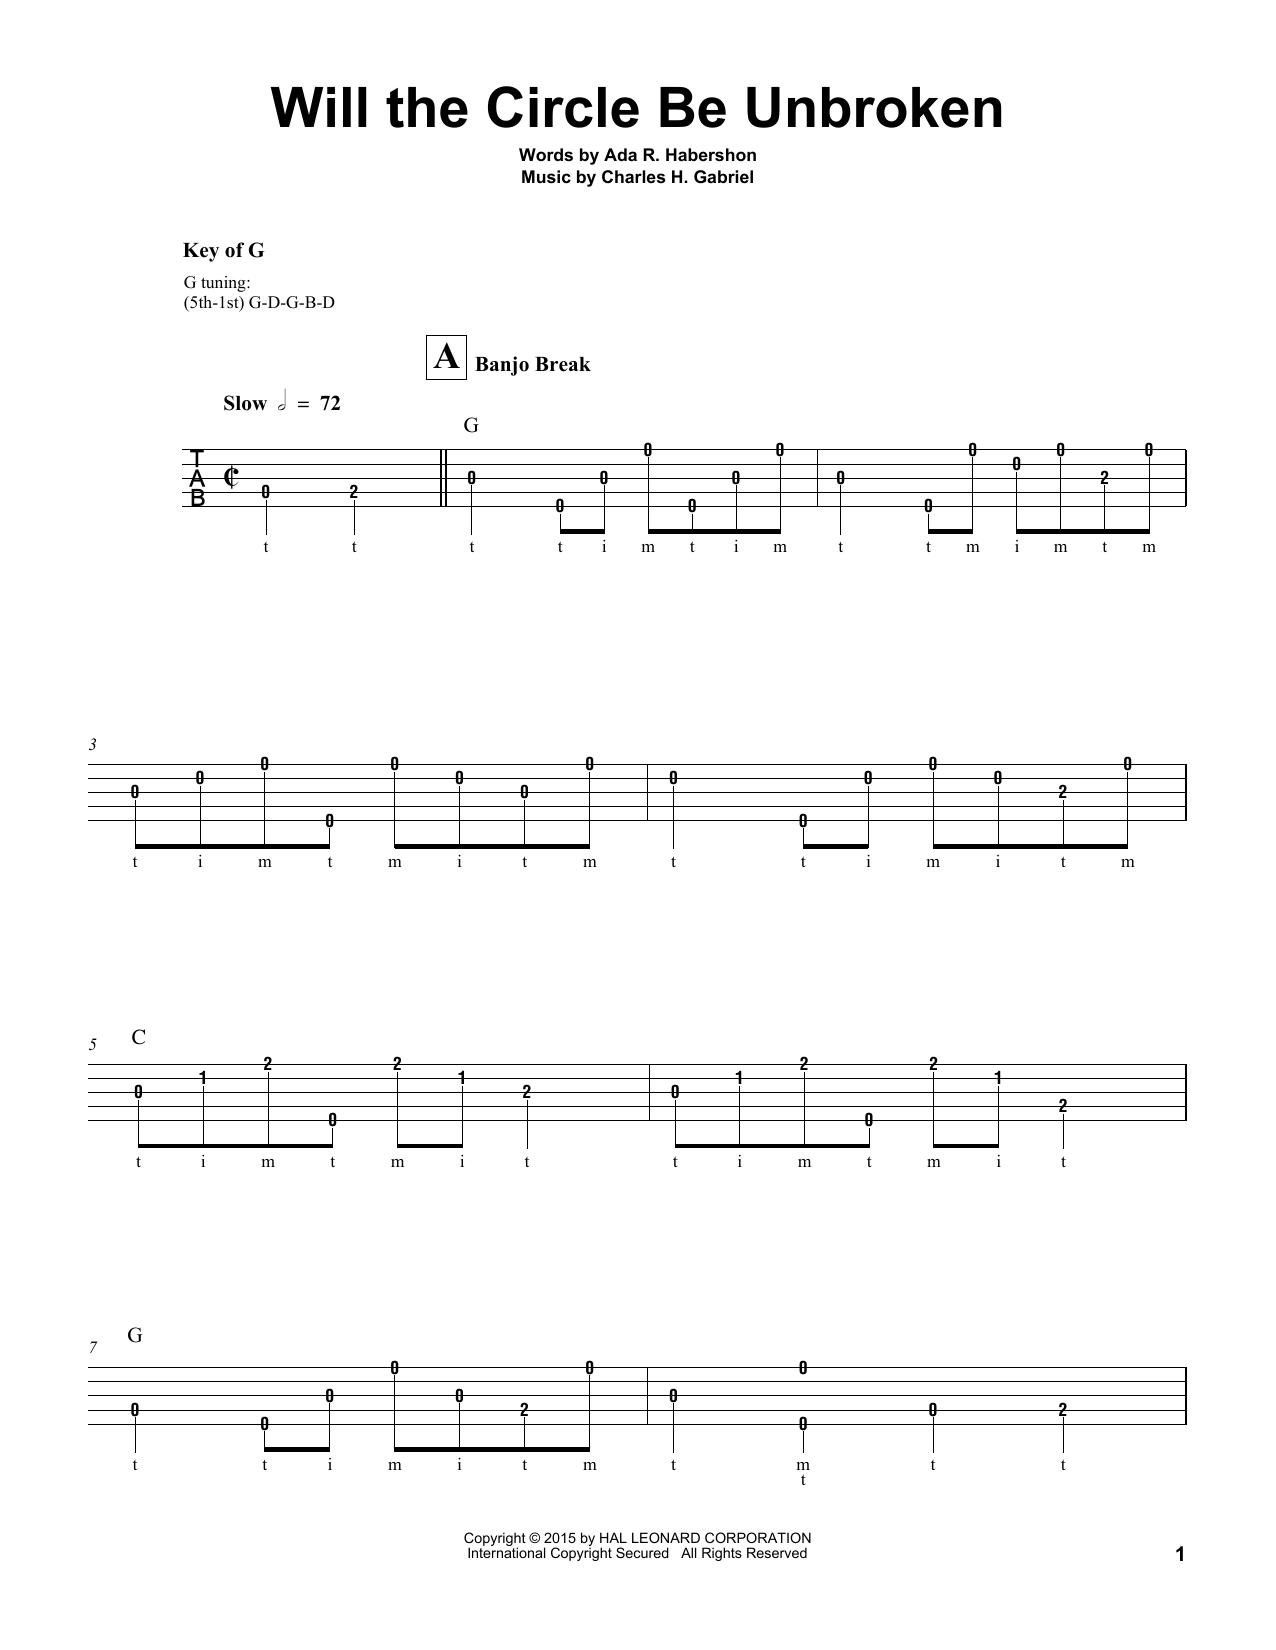 Sheet Music Digital Files To Print Licensed Ada R Habershon